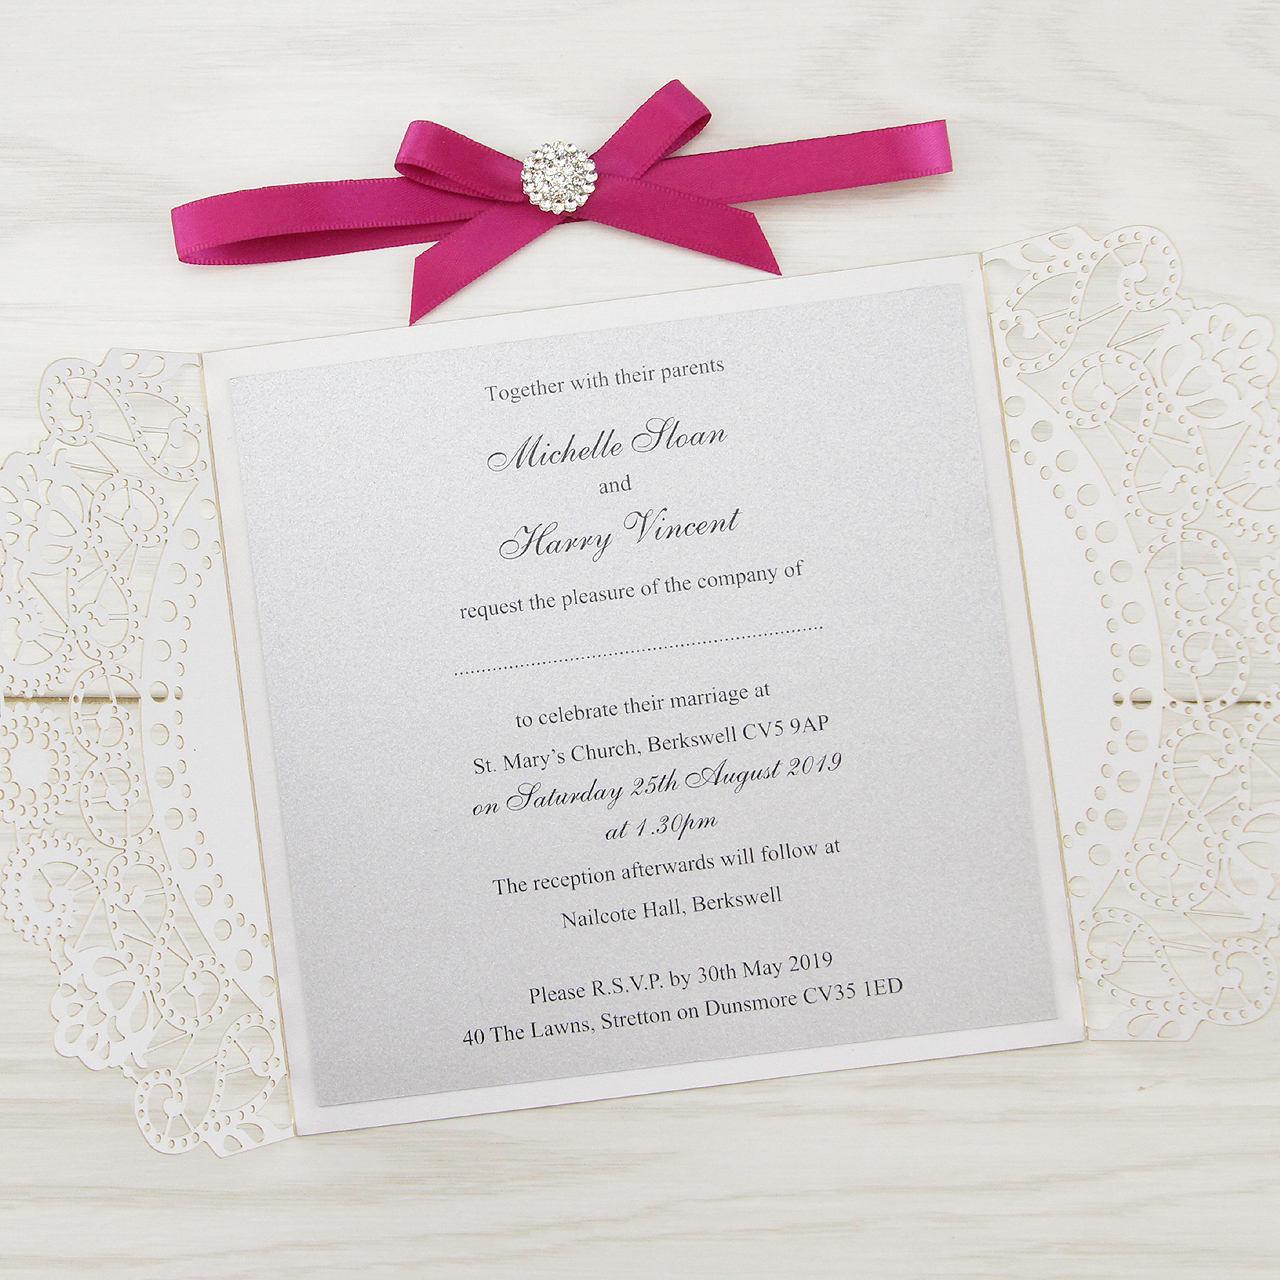 SAMPLE * Doily Laser Cut Wedding Invitation with Diamante Cluster ...